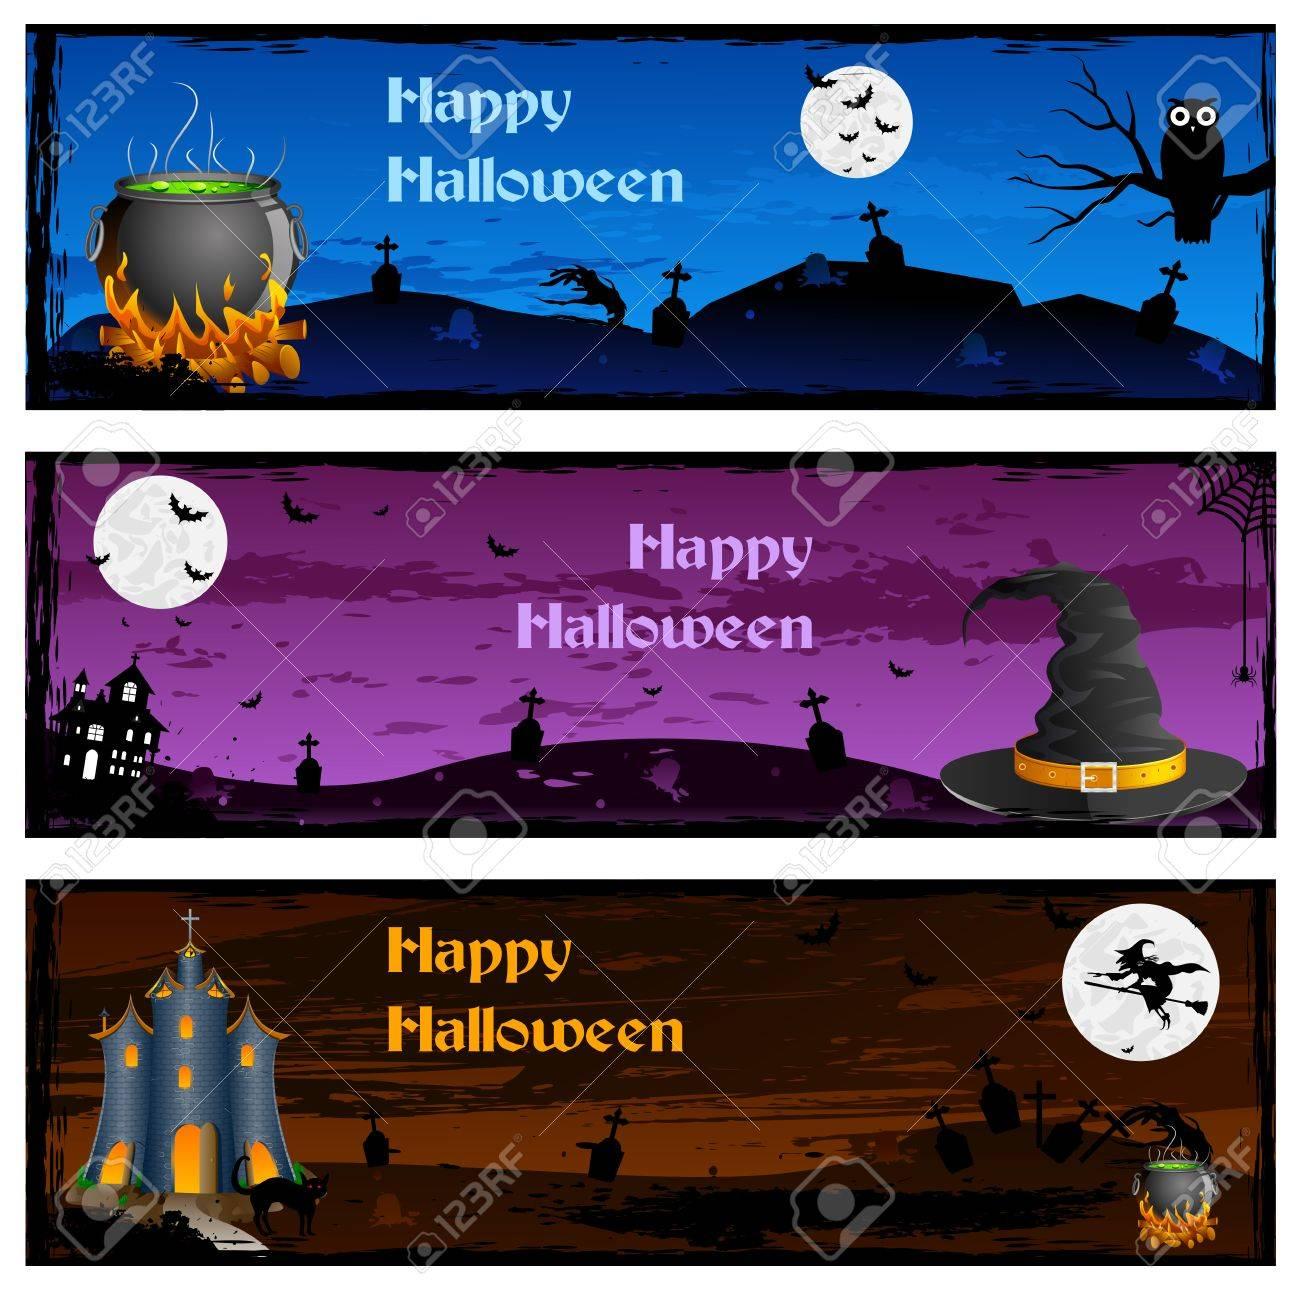 easy to edit vector illustration of halloween banner royalty free rh 123rf com Grunge Star Vector Vector Scroll